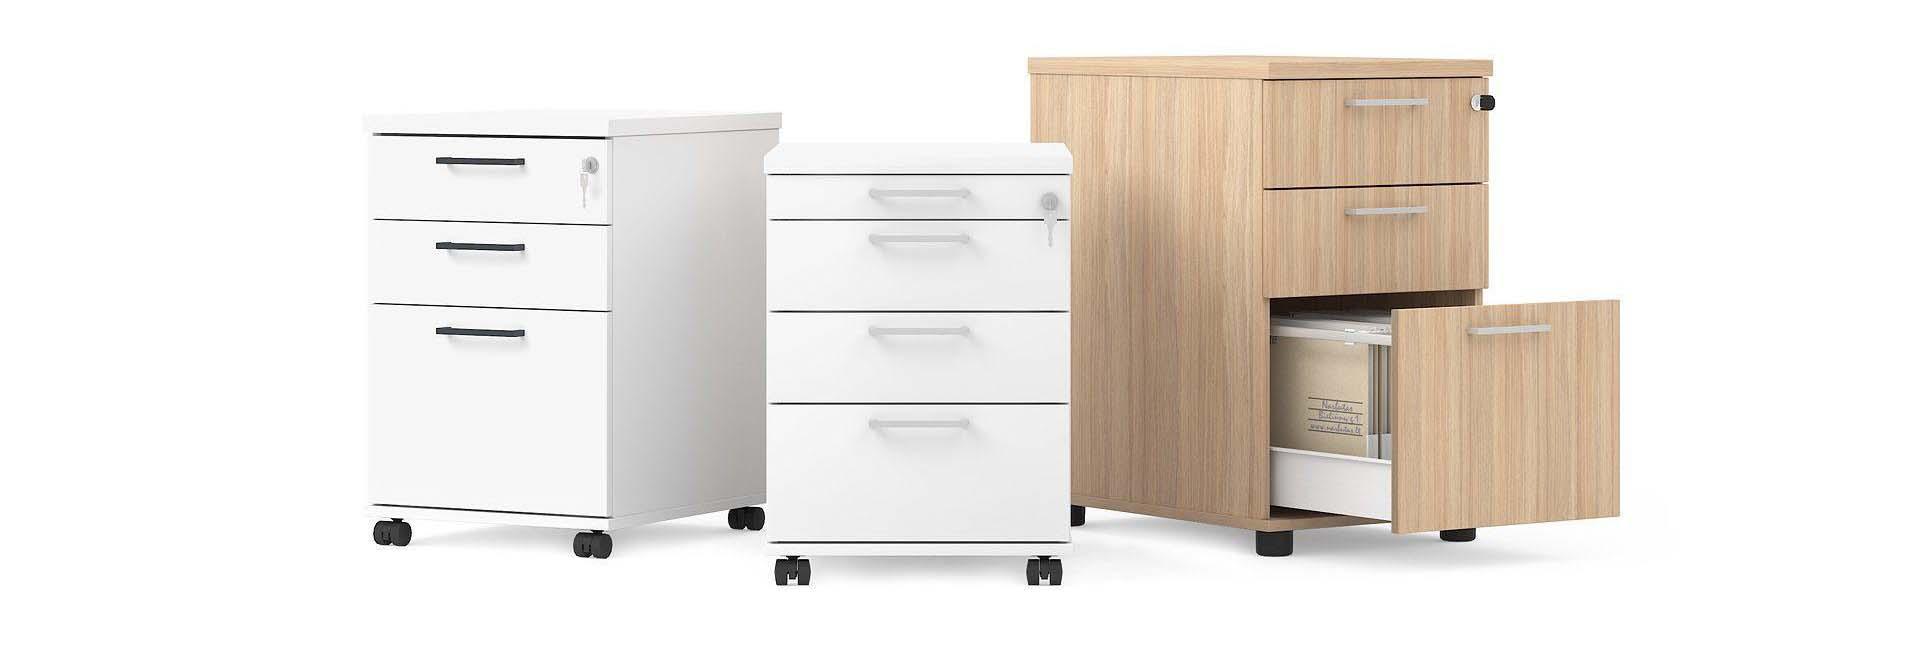 Storage-pedestals-OPTIMA-Narbutas-1920x864